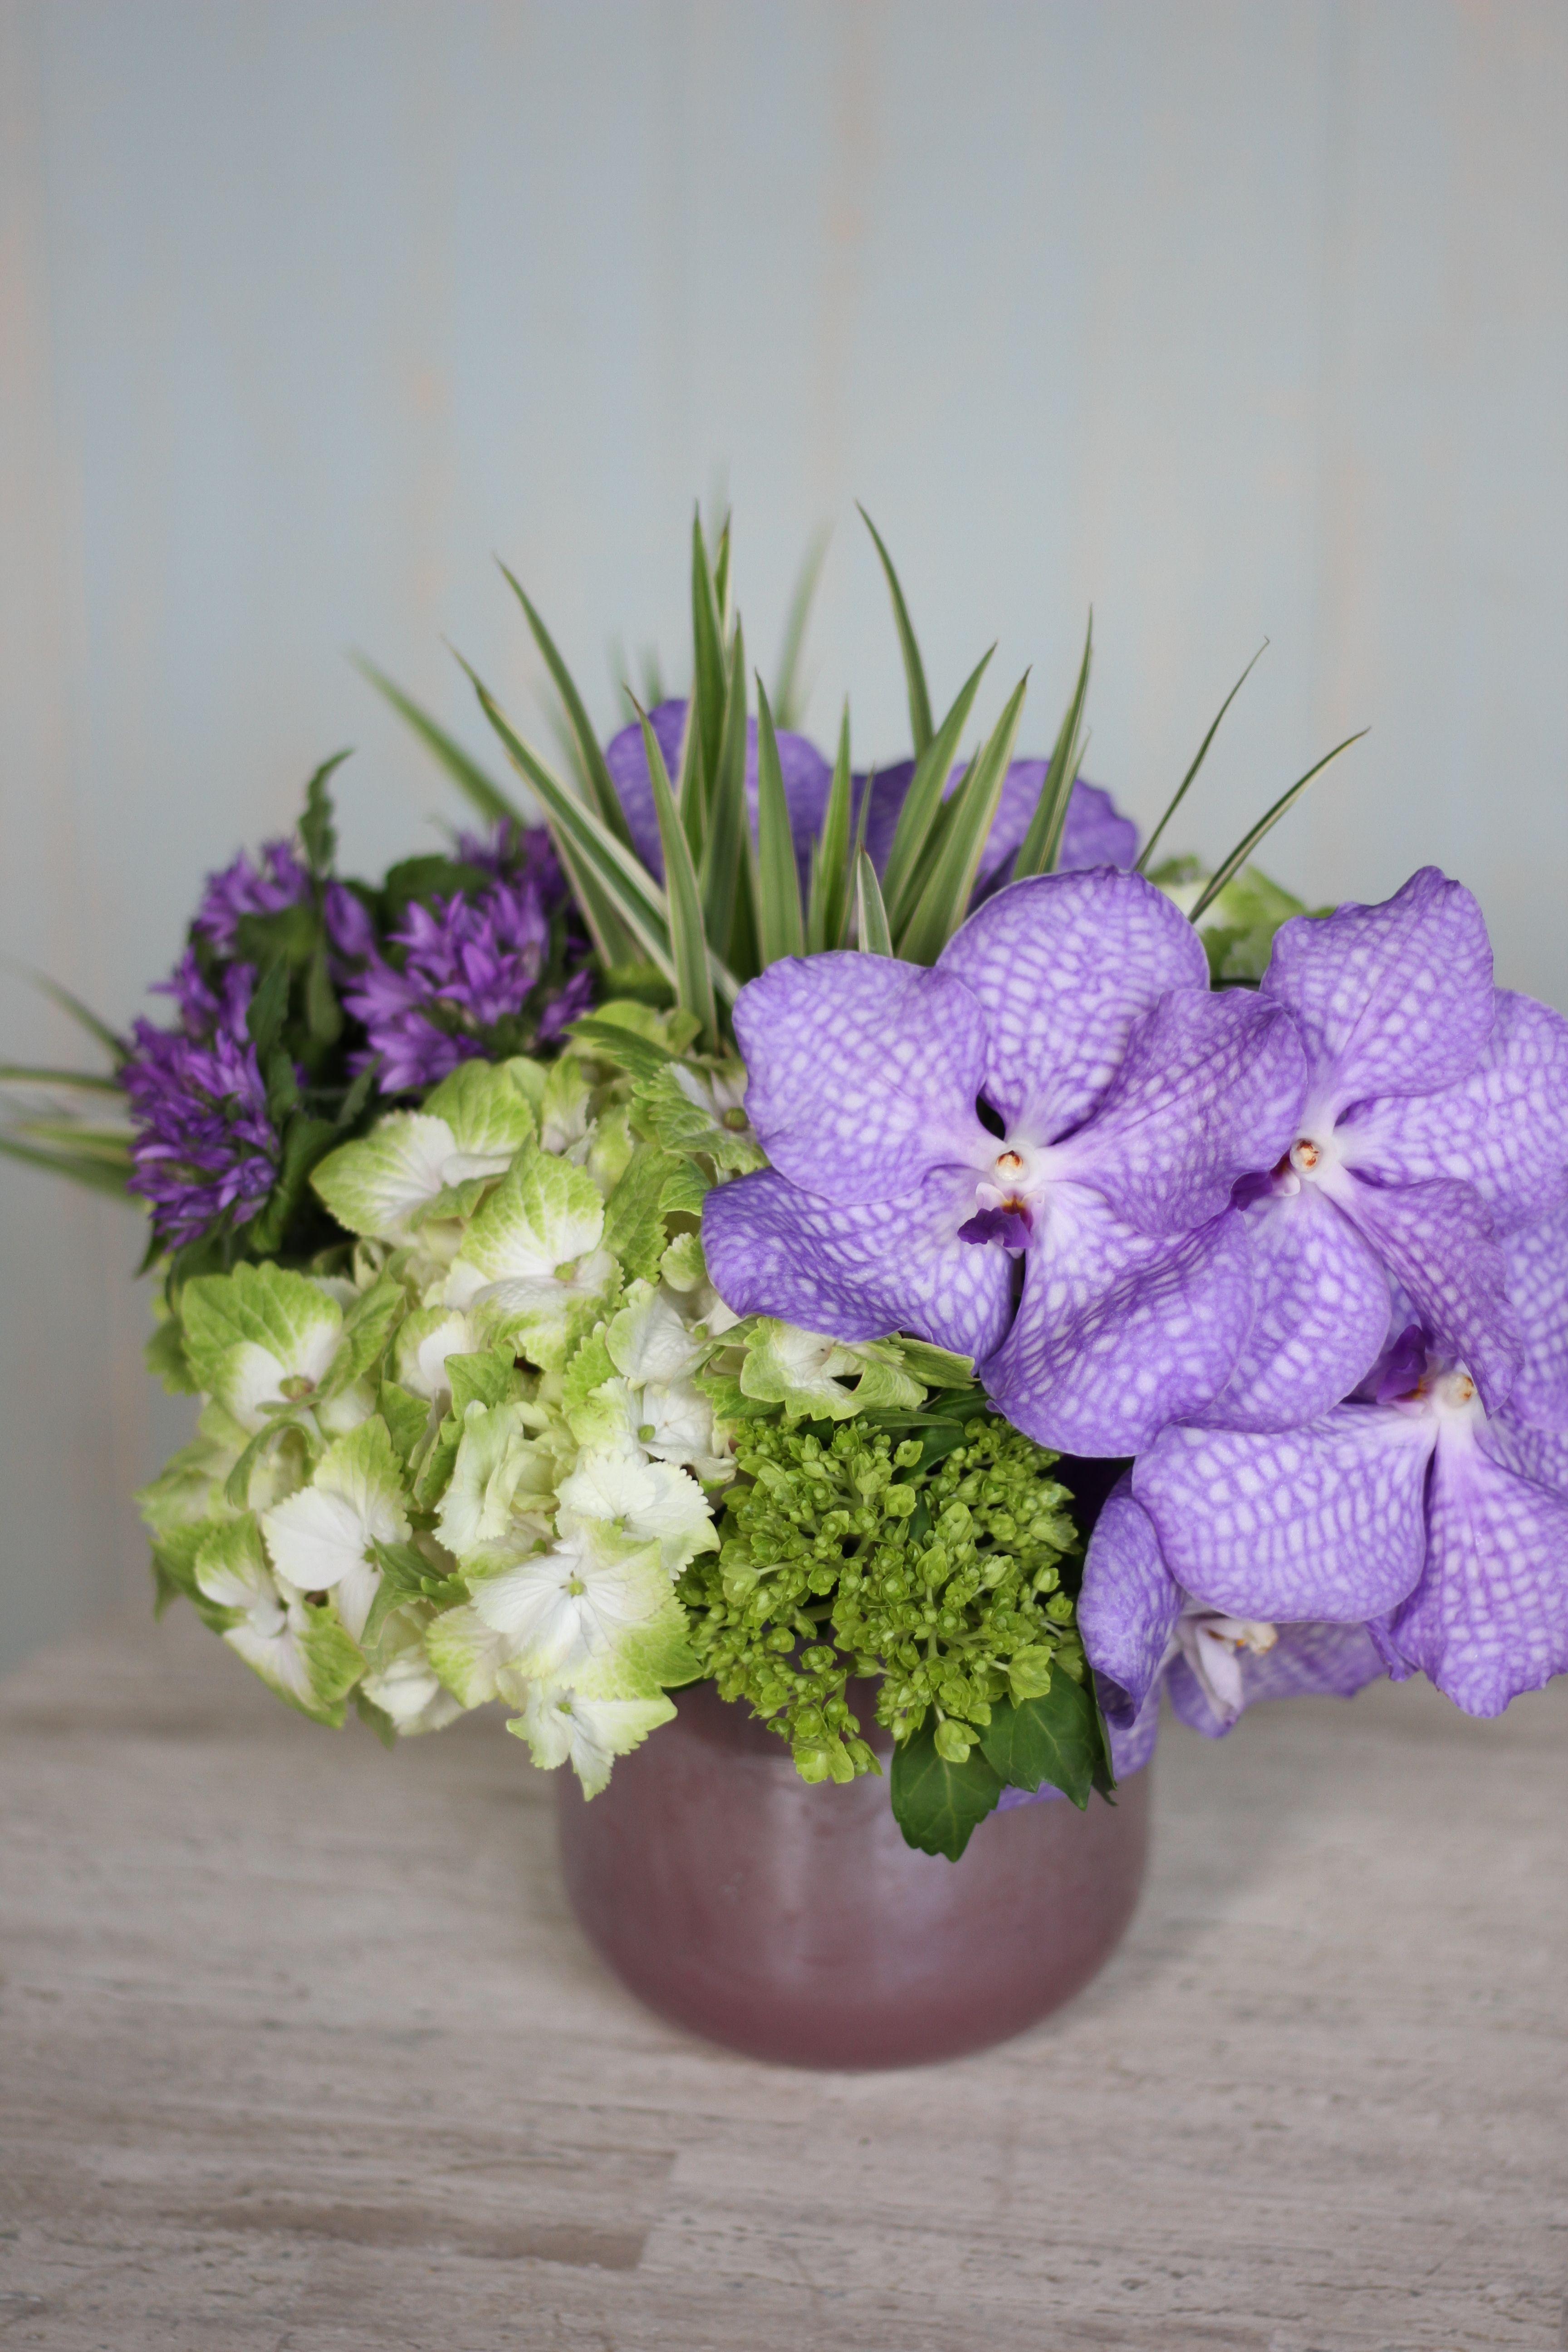 Vanda Orchid Blooms And Deep Purple Campanula Violet Garden By Winston Flowers Fresh Flowers Arrangements Flower Arrangements Unique Flower Arrangements